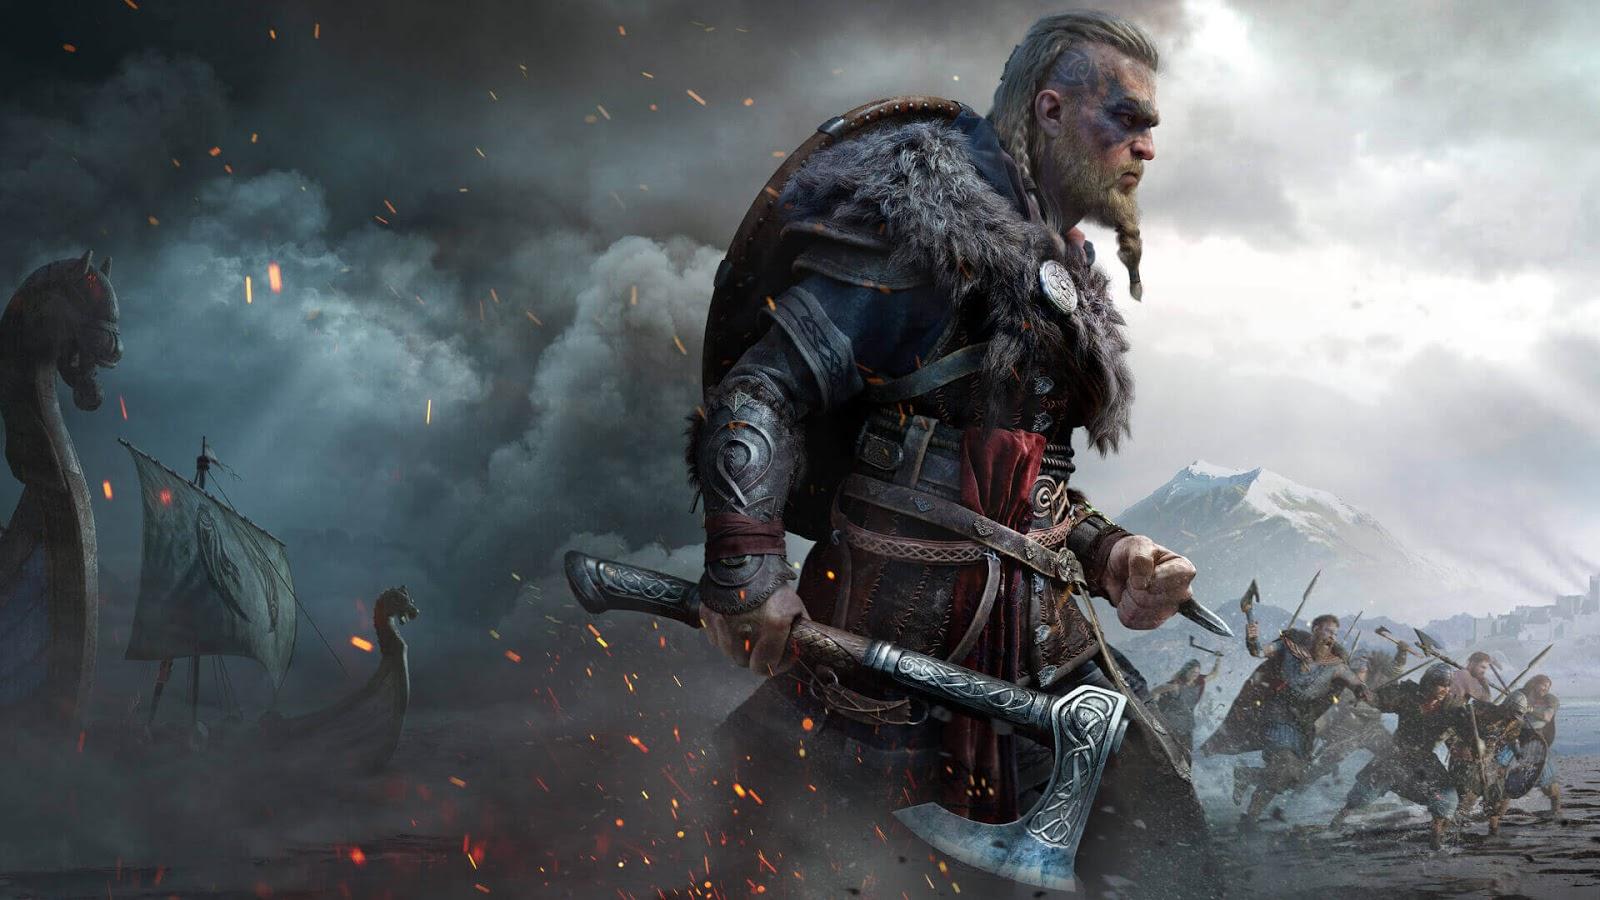 Assassin's Creed Valhalla Resmi Hadir Untuk PS5 dan Xbox Series X